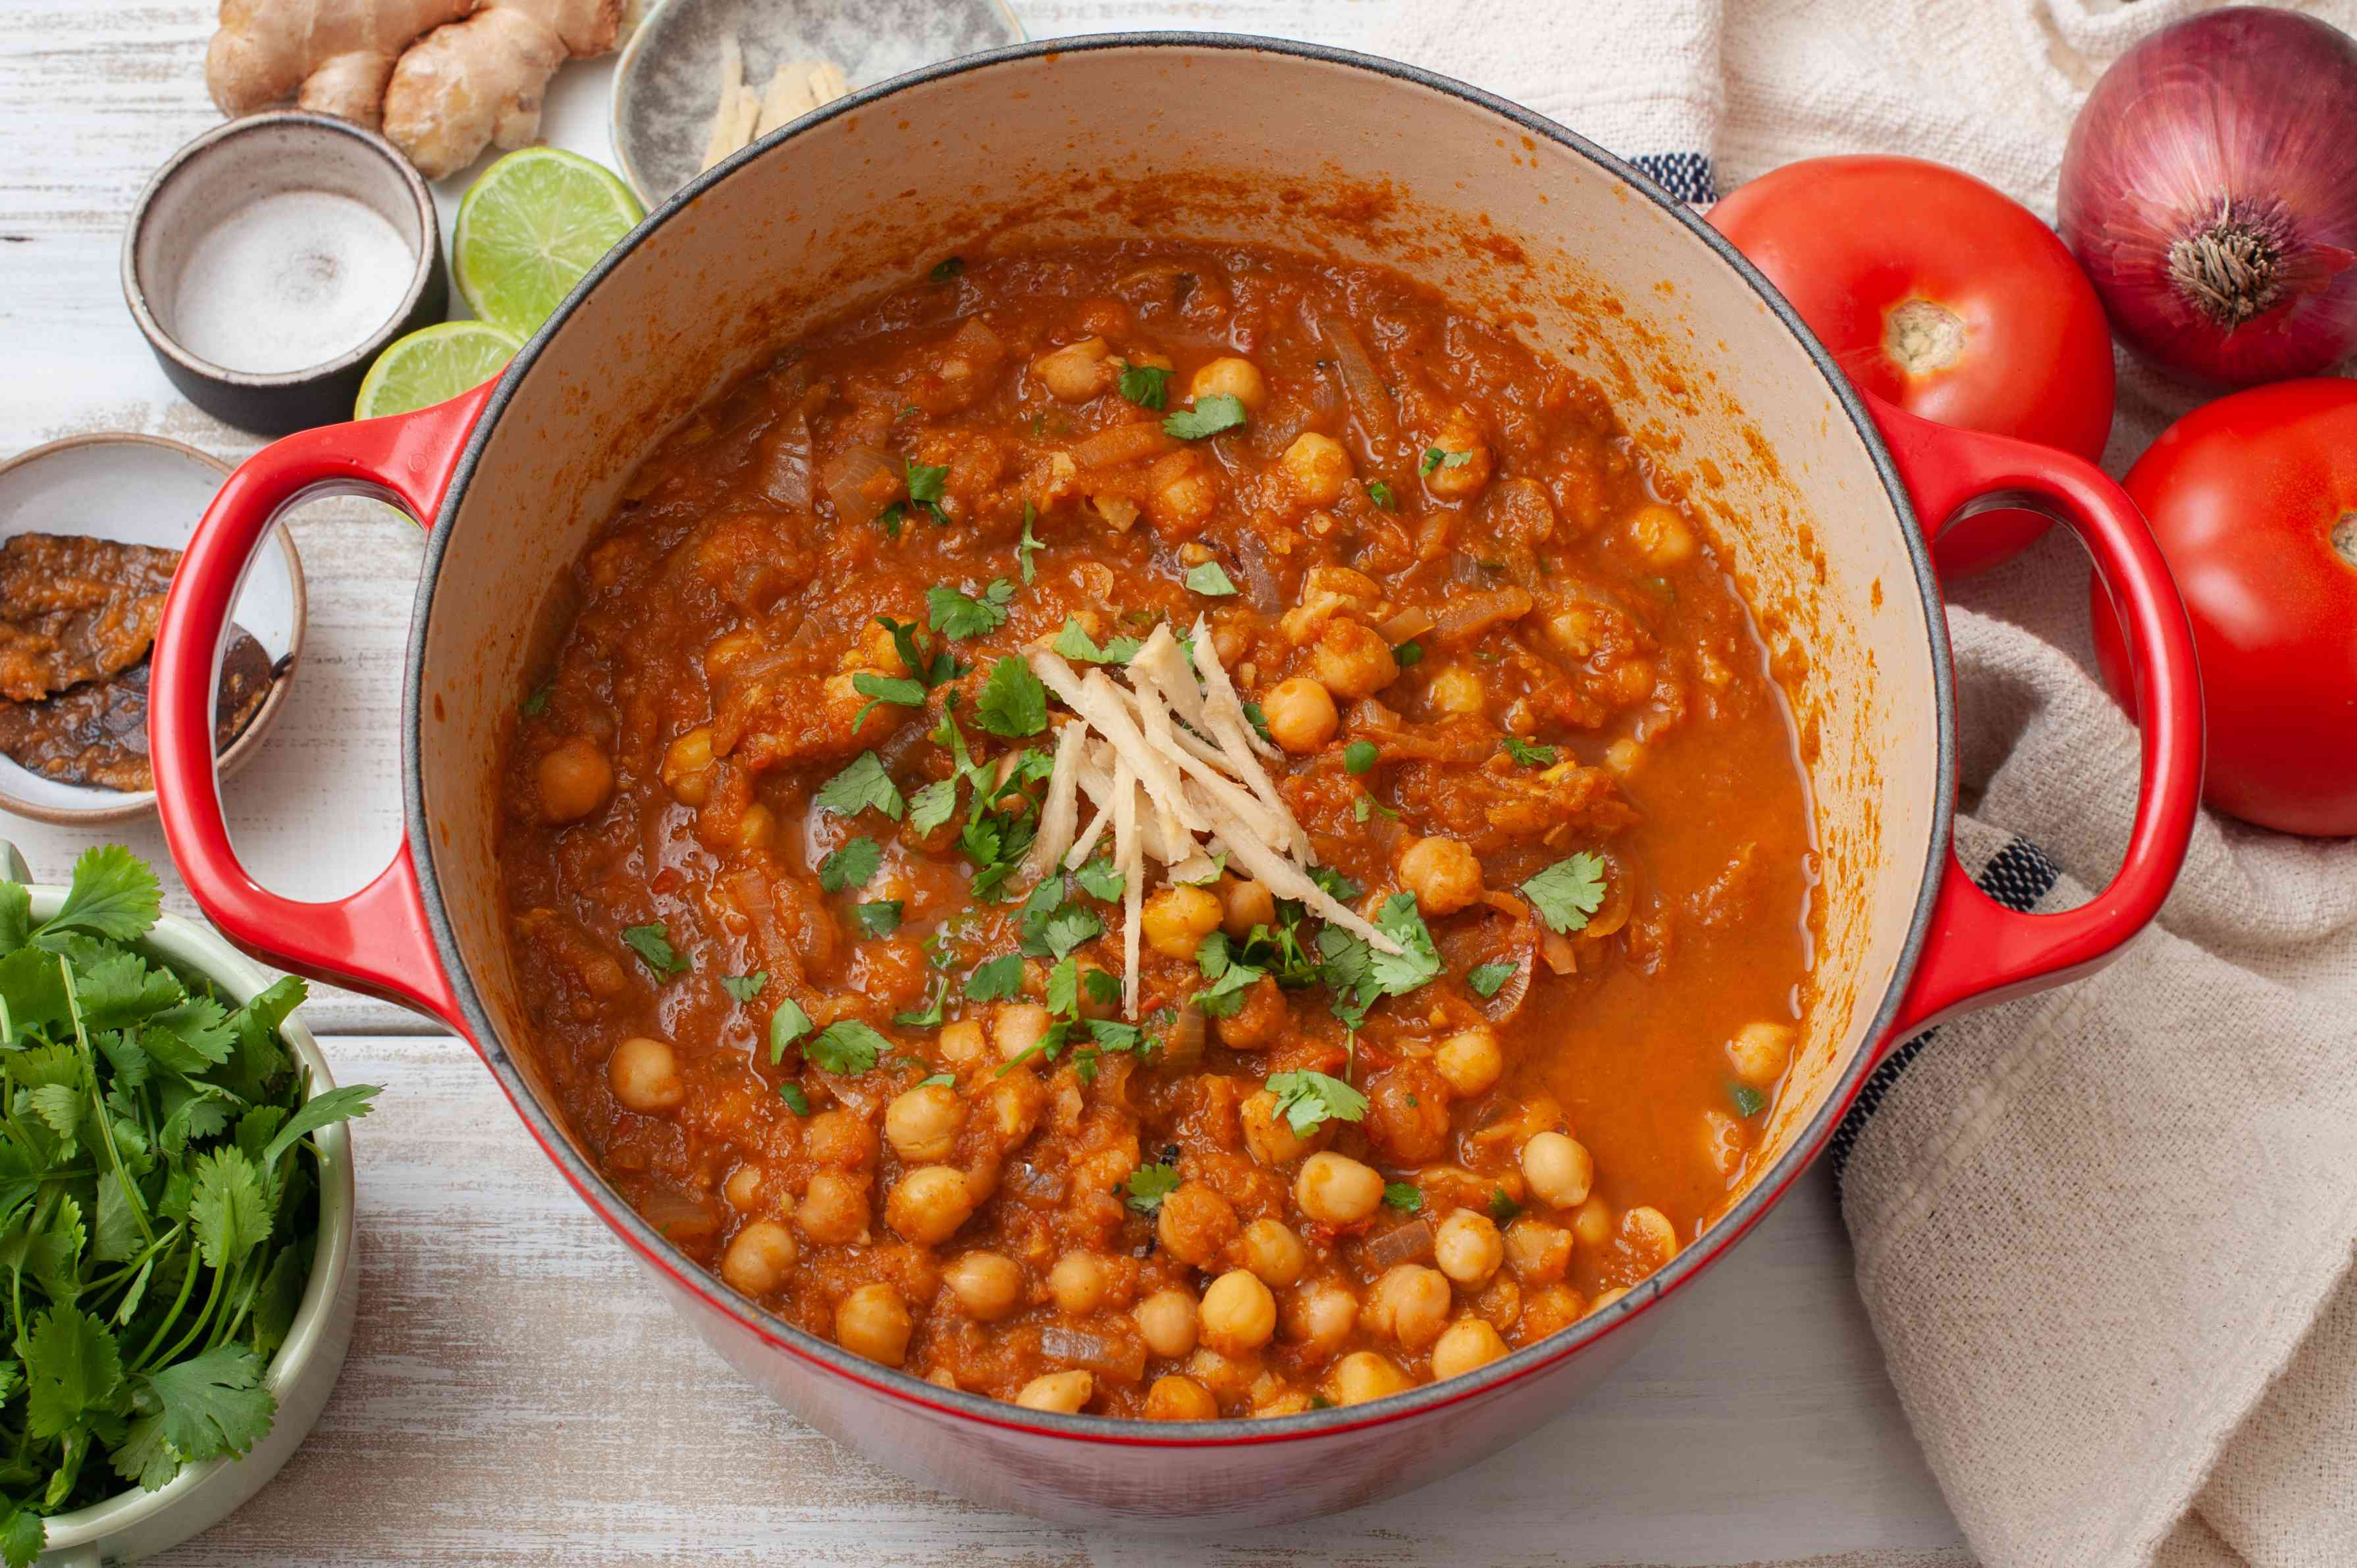 Chole chickpea curry